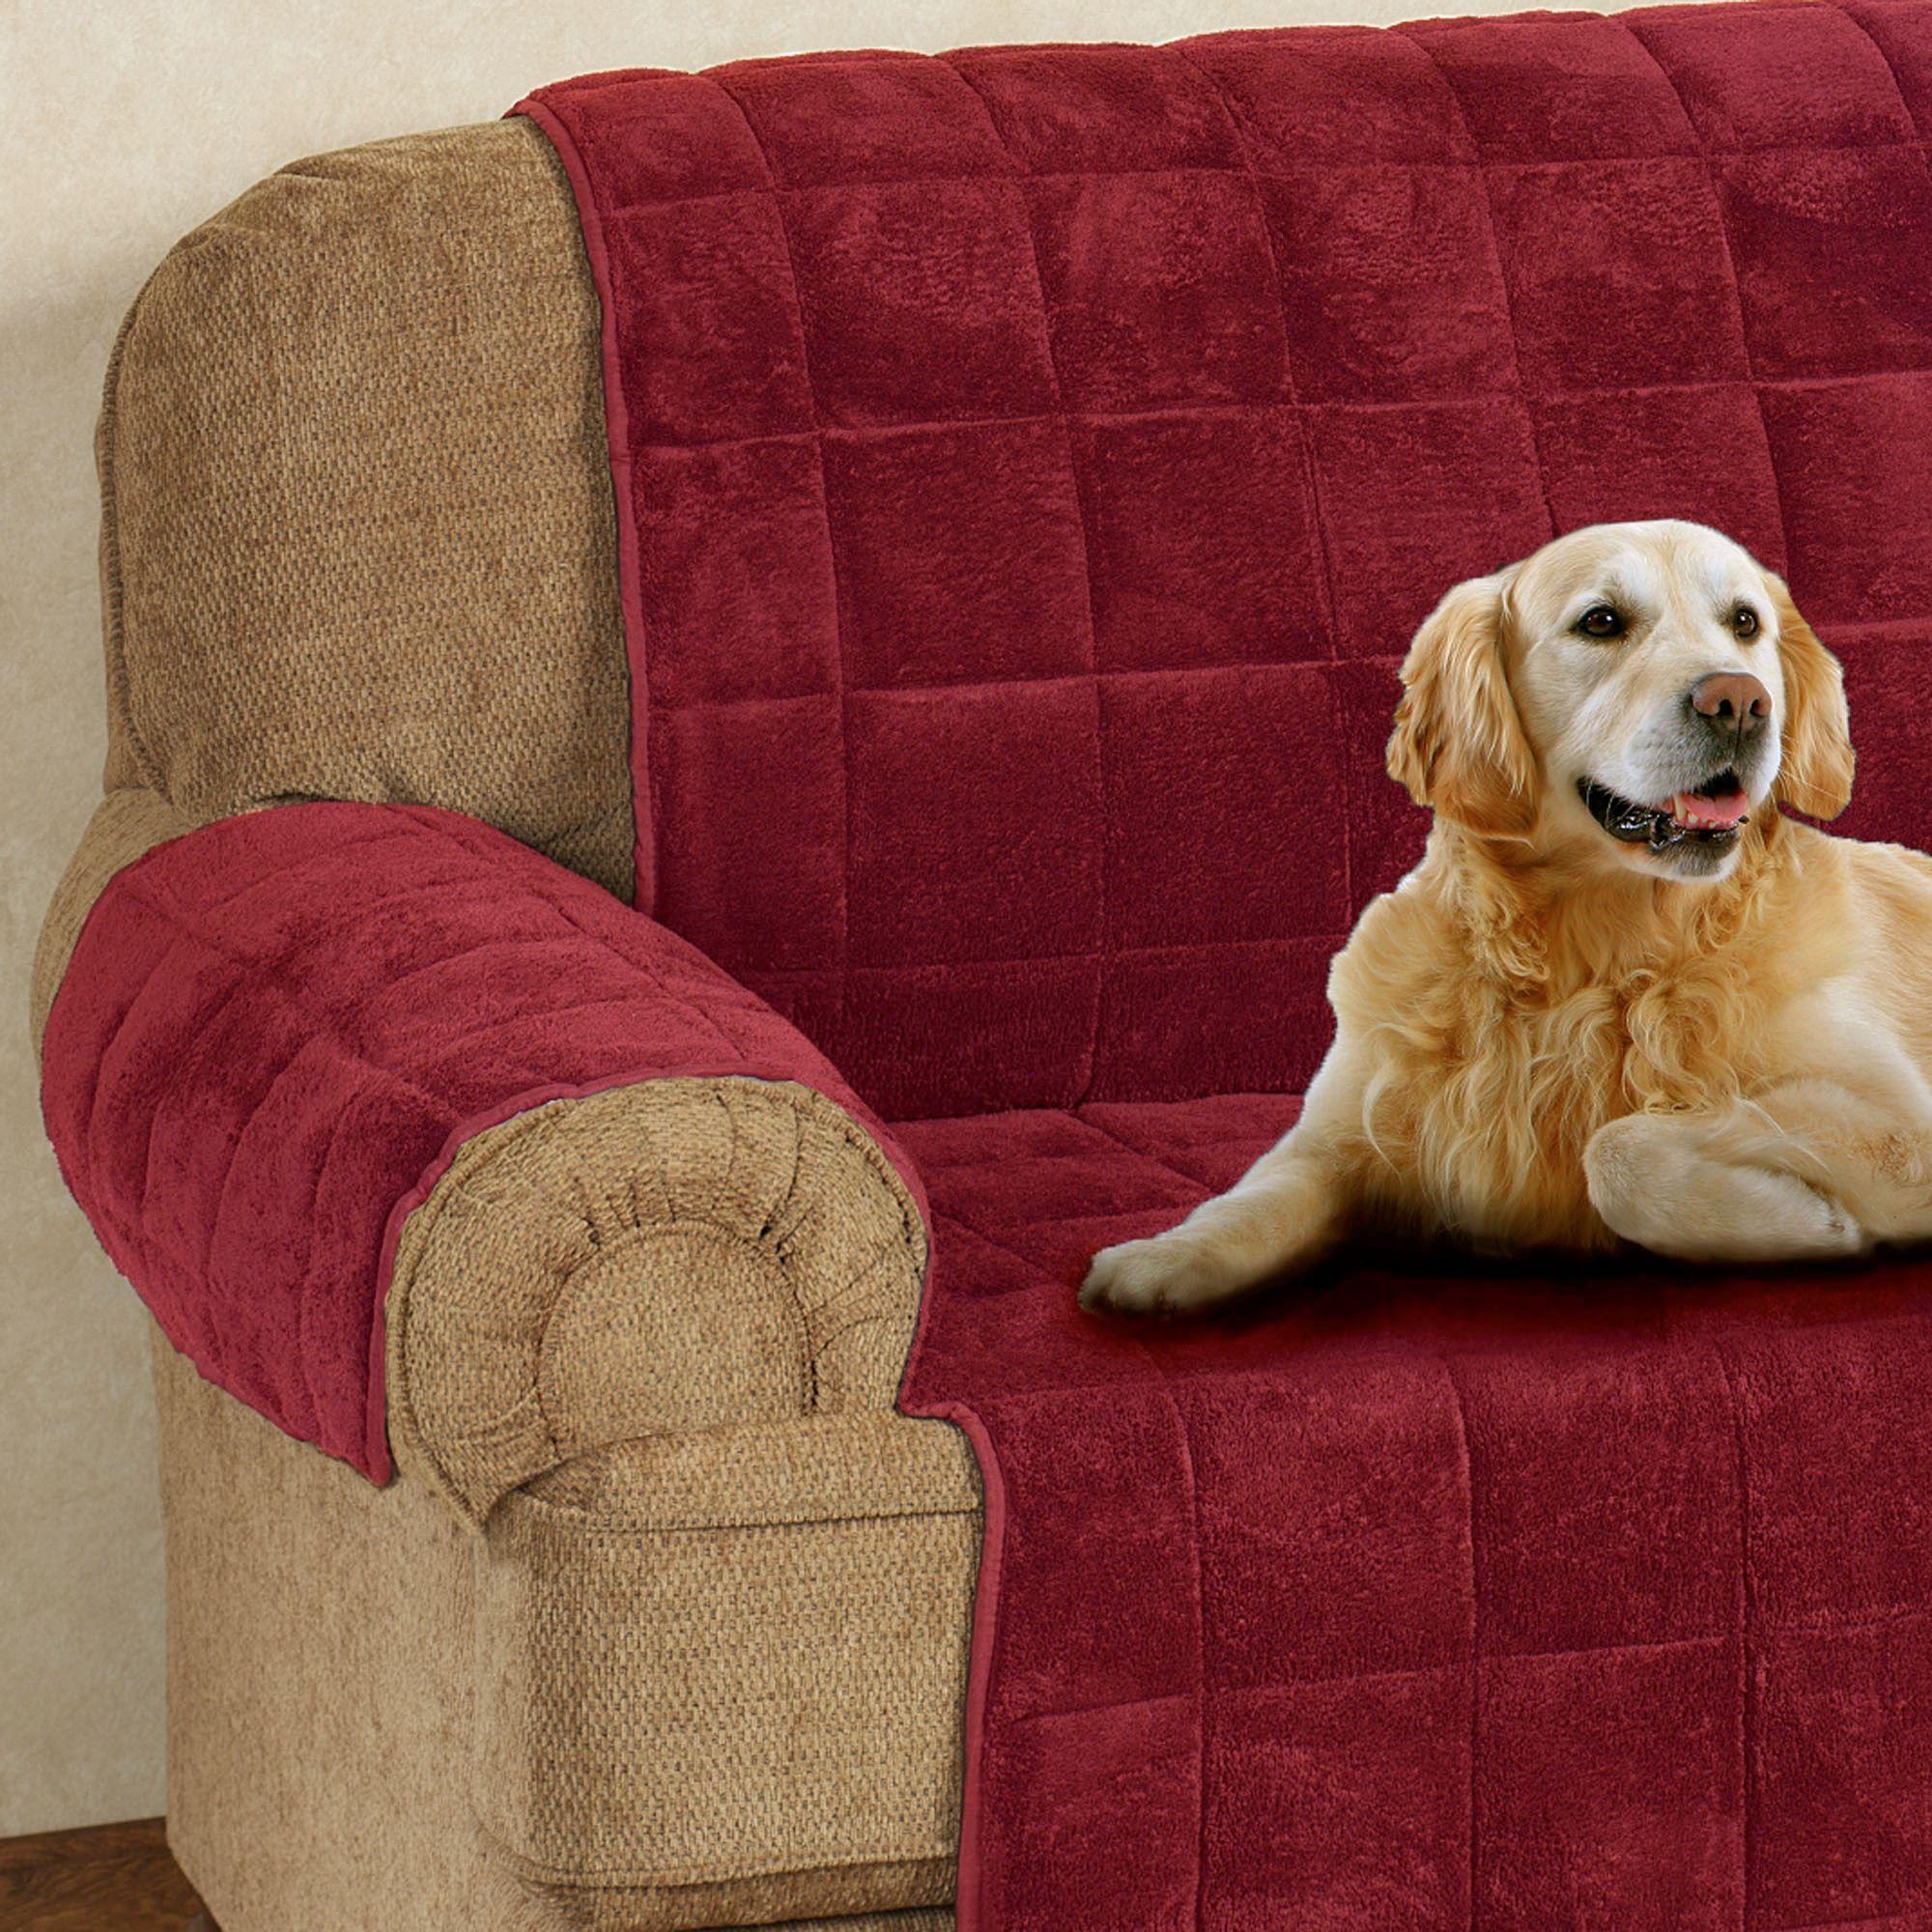 long sofa pet cover funda de ekeskog microplush furniture covers with longer back flap